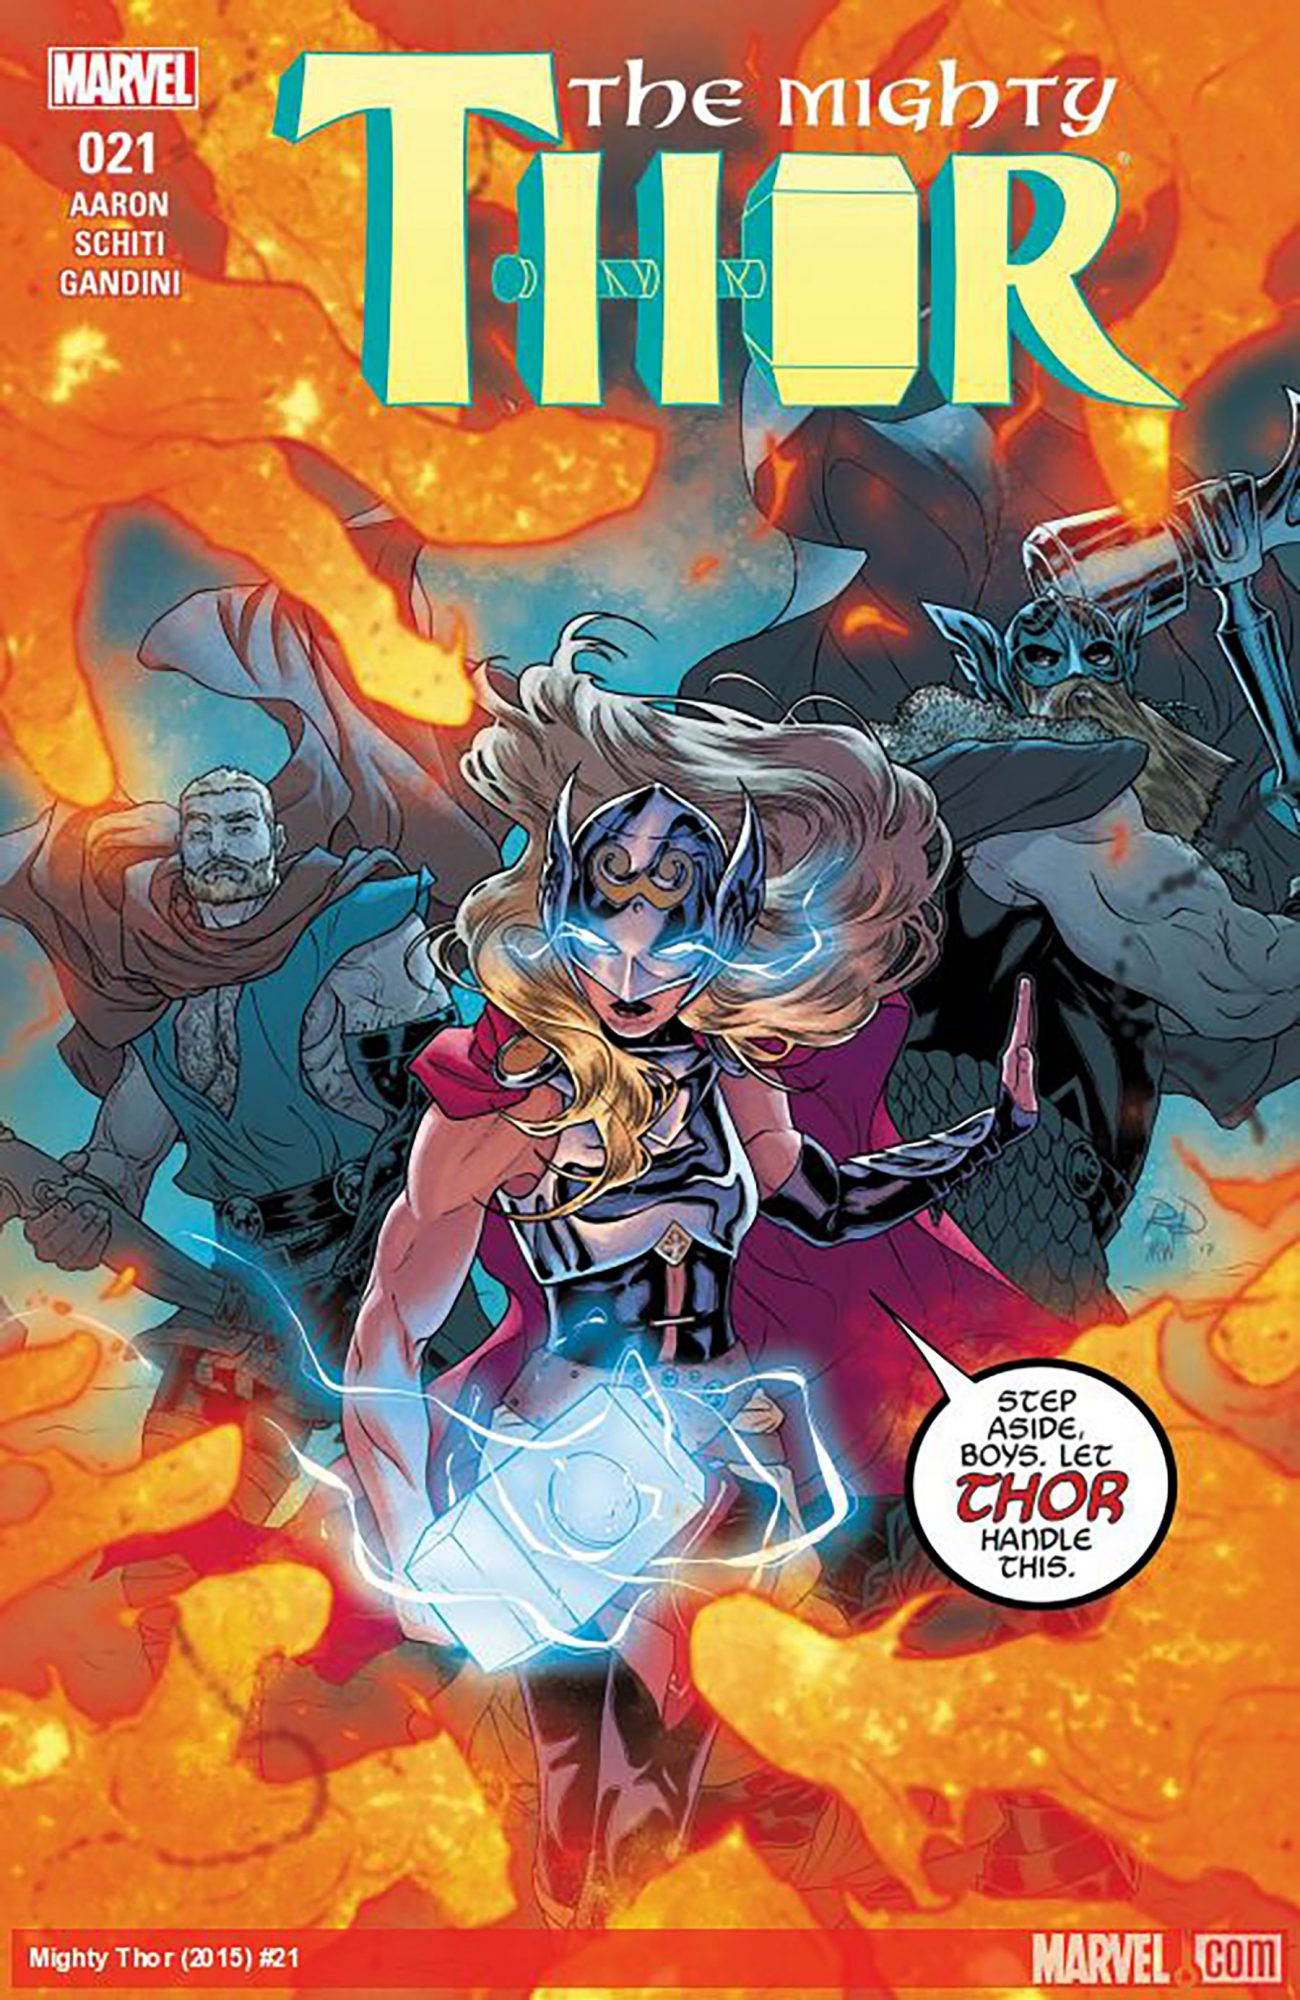 Female Thor (2014)